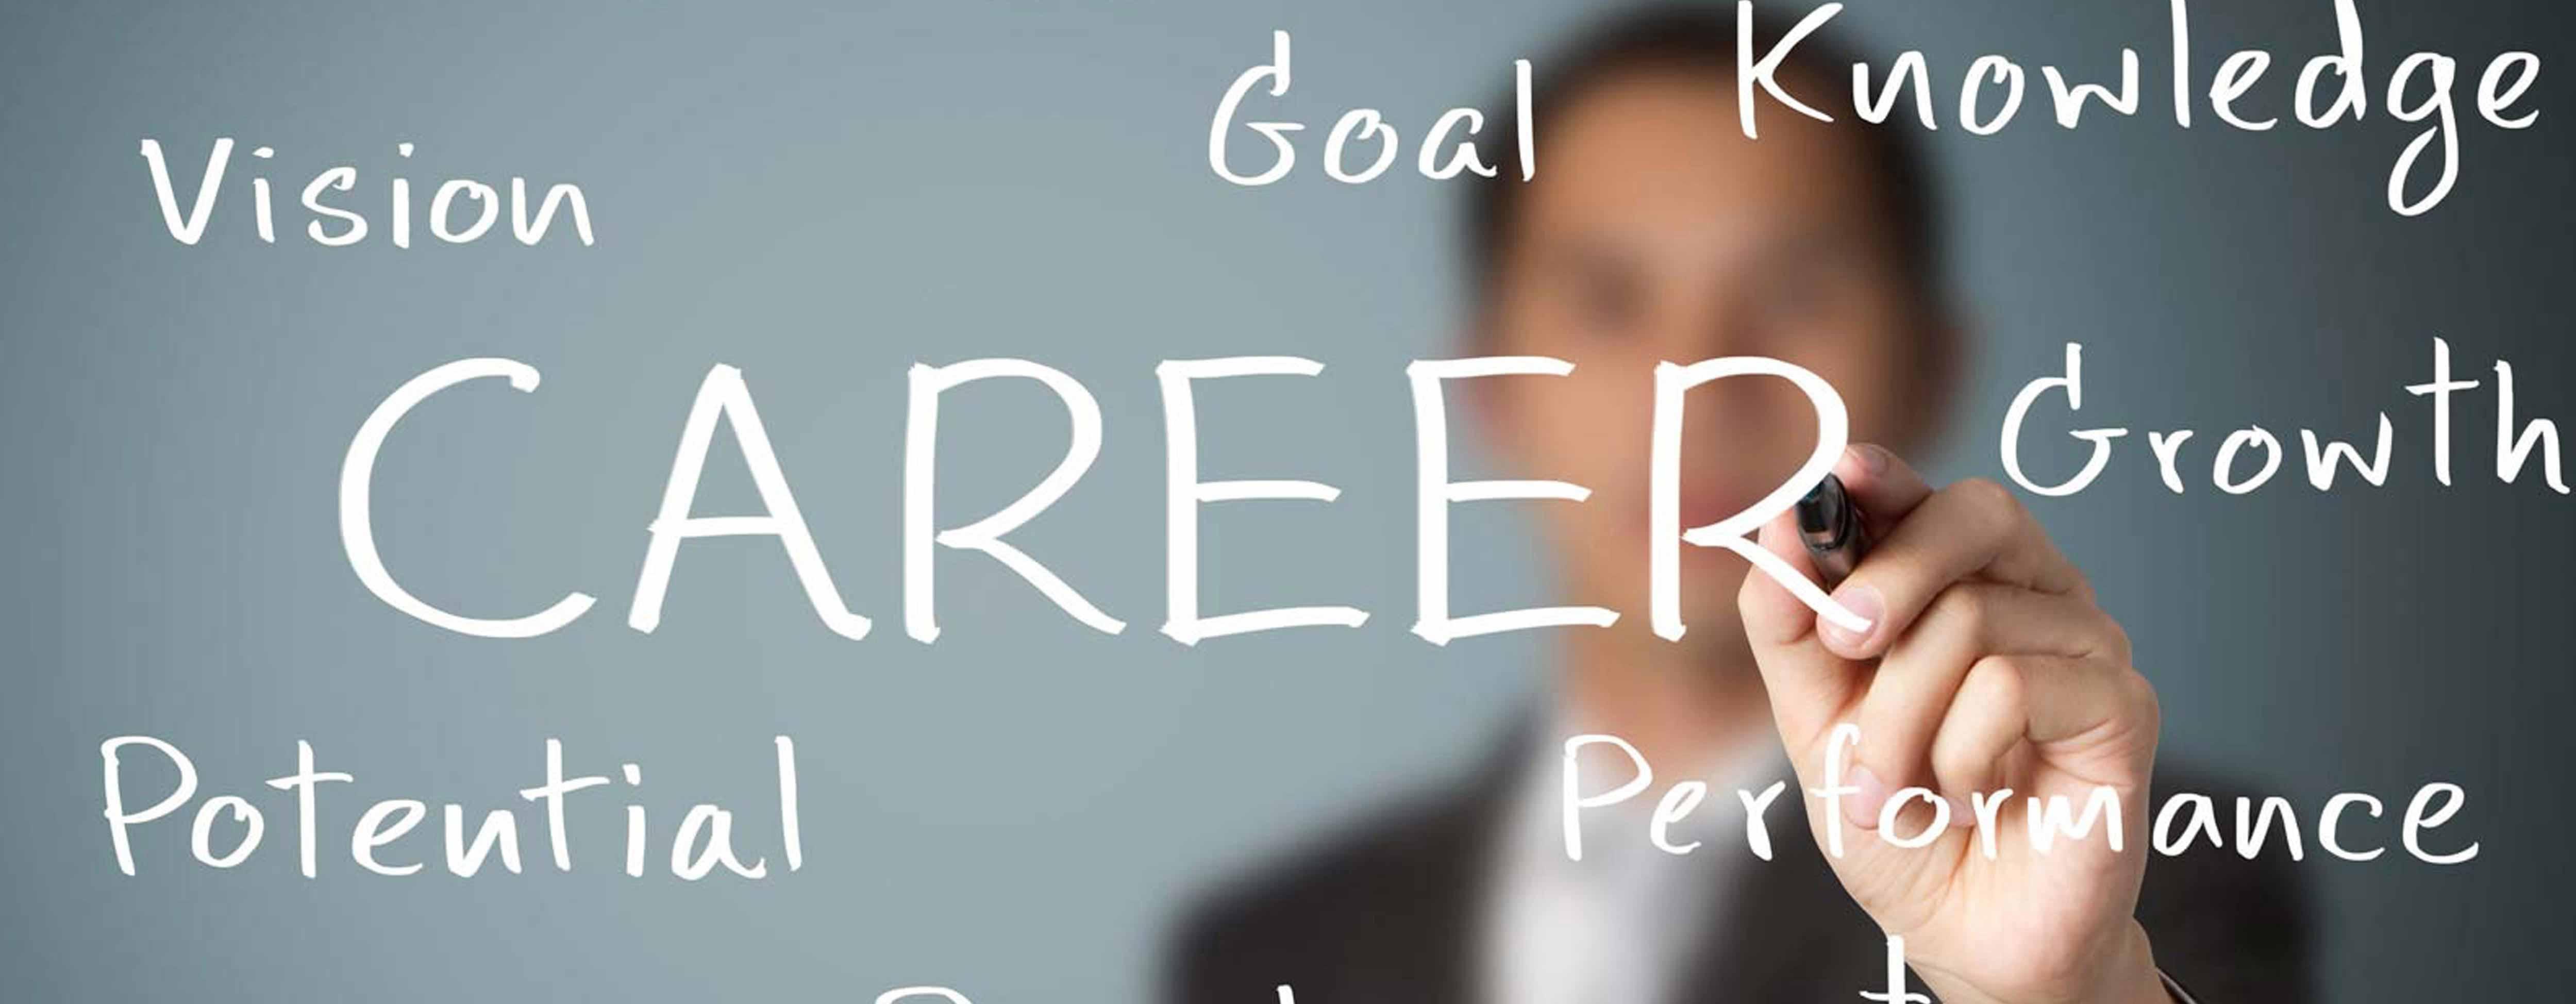 Career Change Coaching